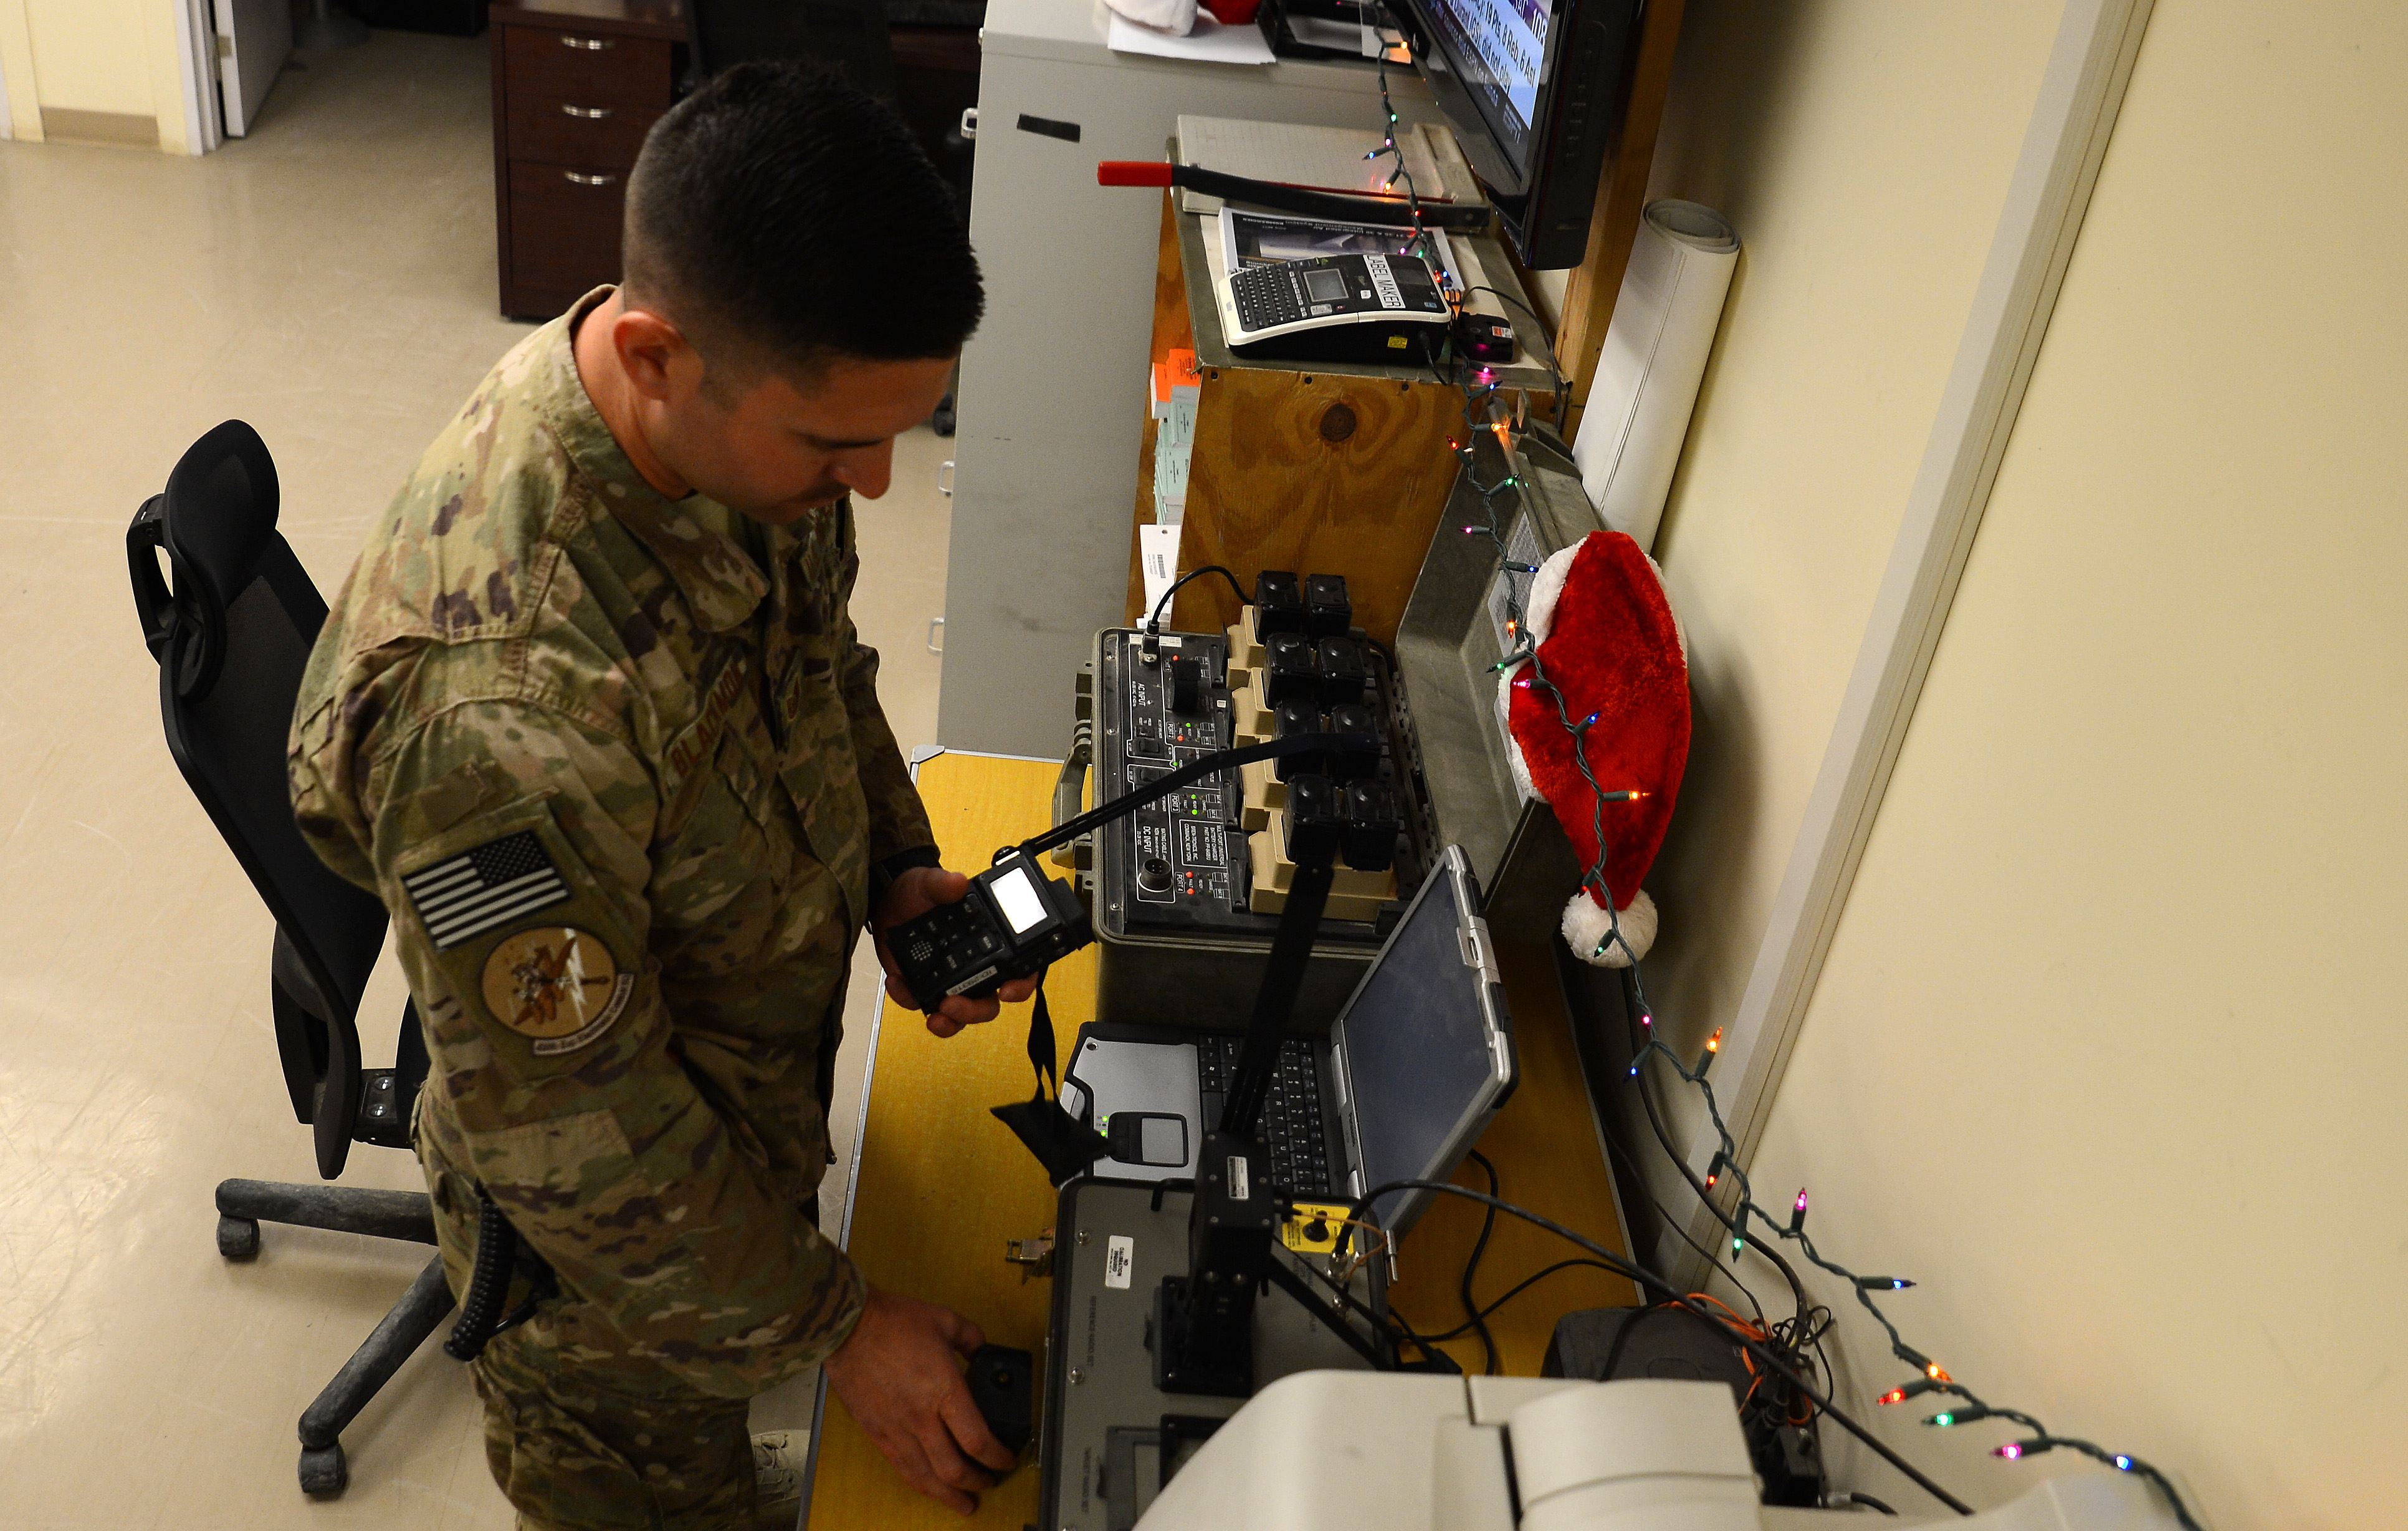 US Aircrew Combat Flight & Survival Gear